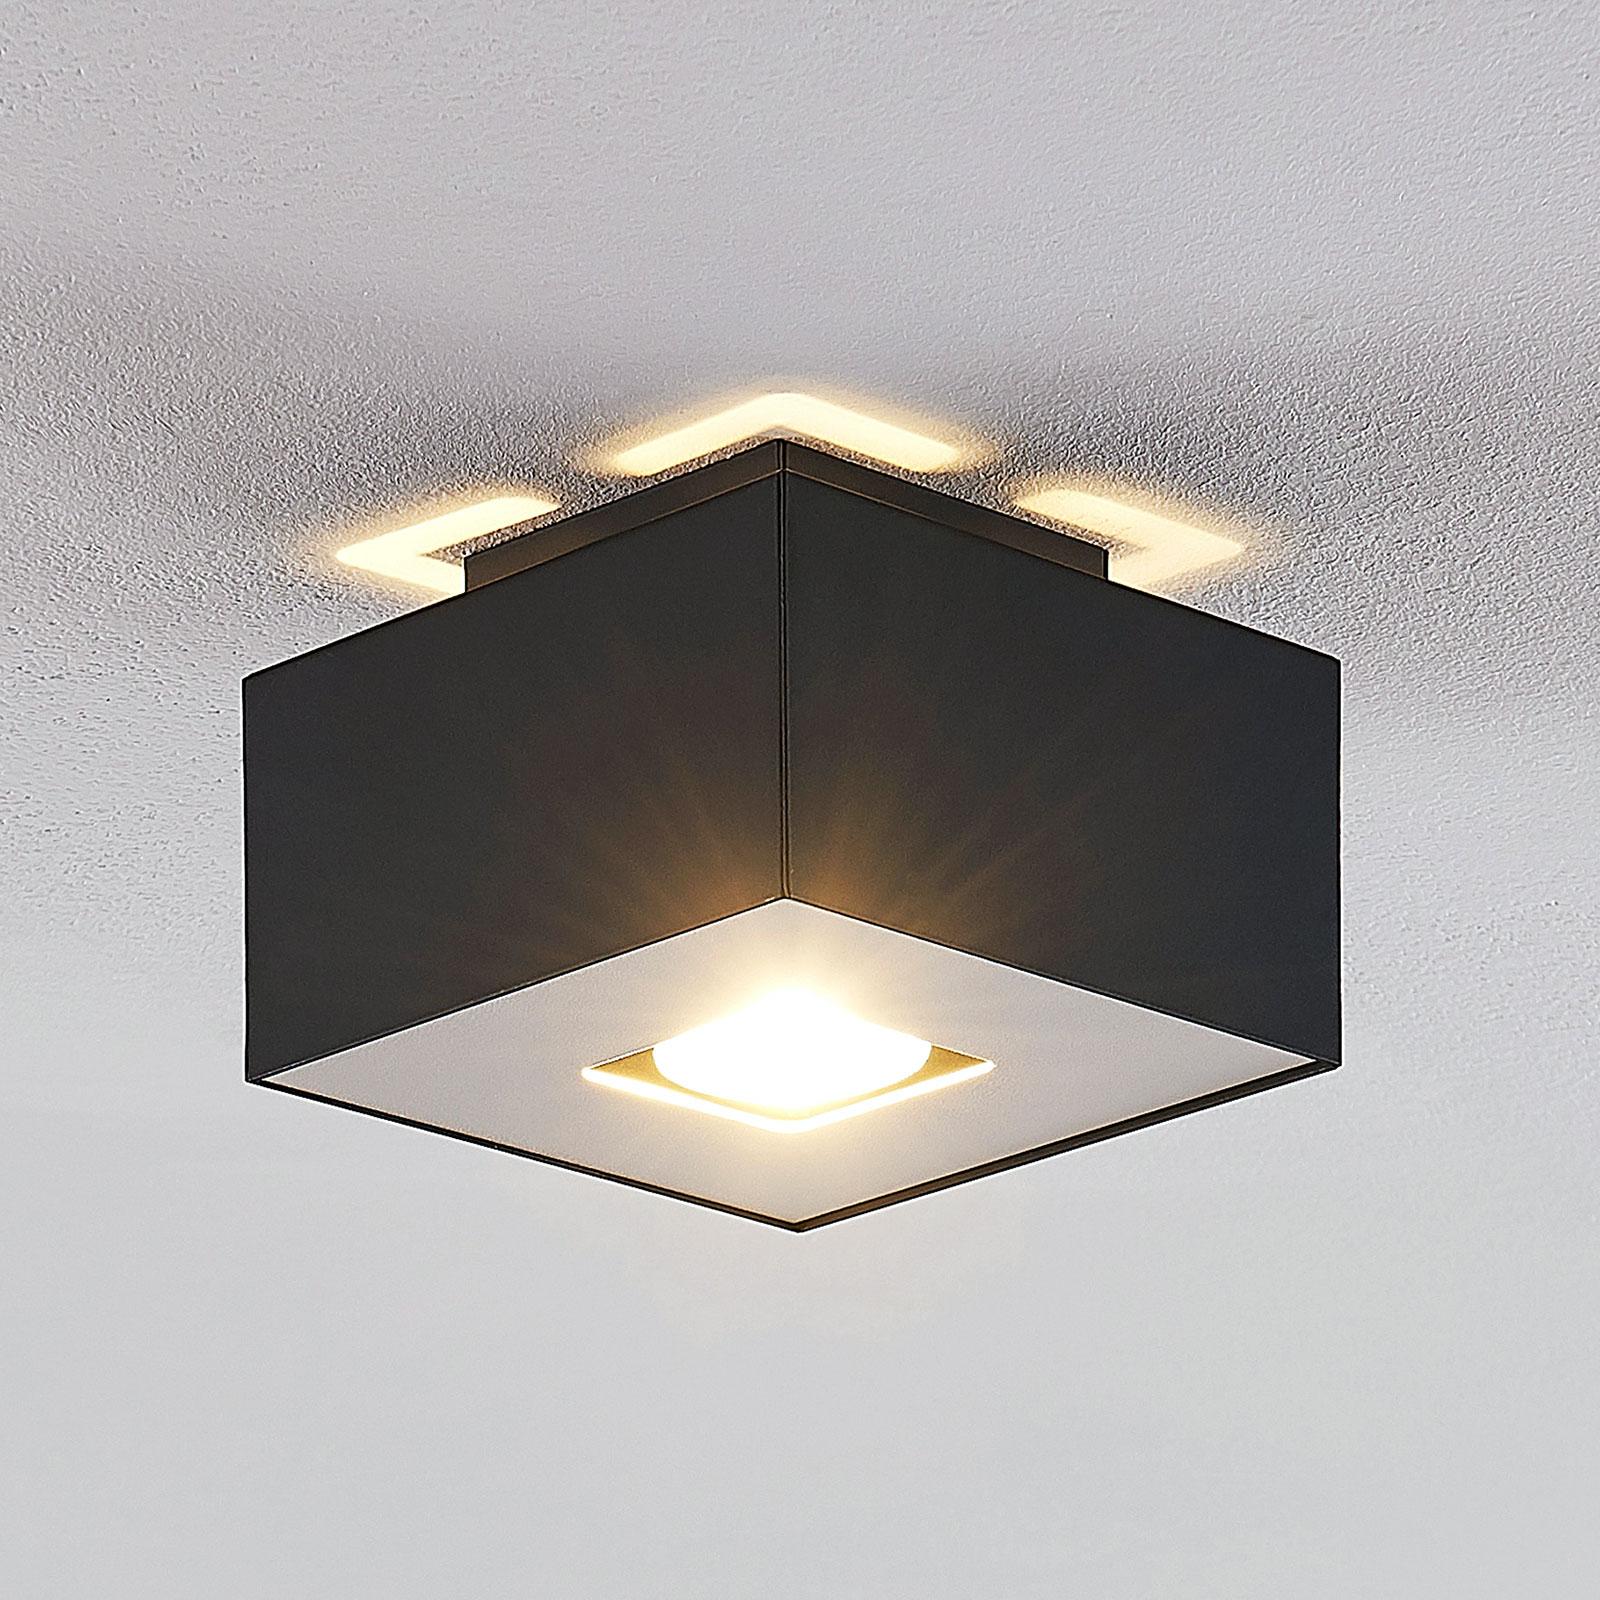 Lindby Kasi plafondlamp, 1-lamp, 14 x 14 cm